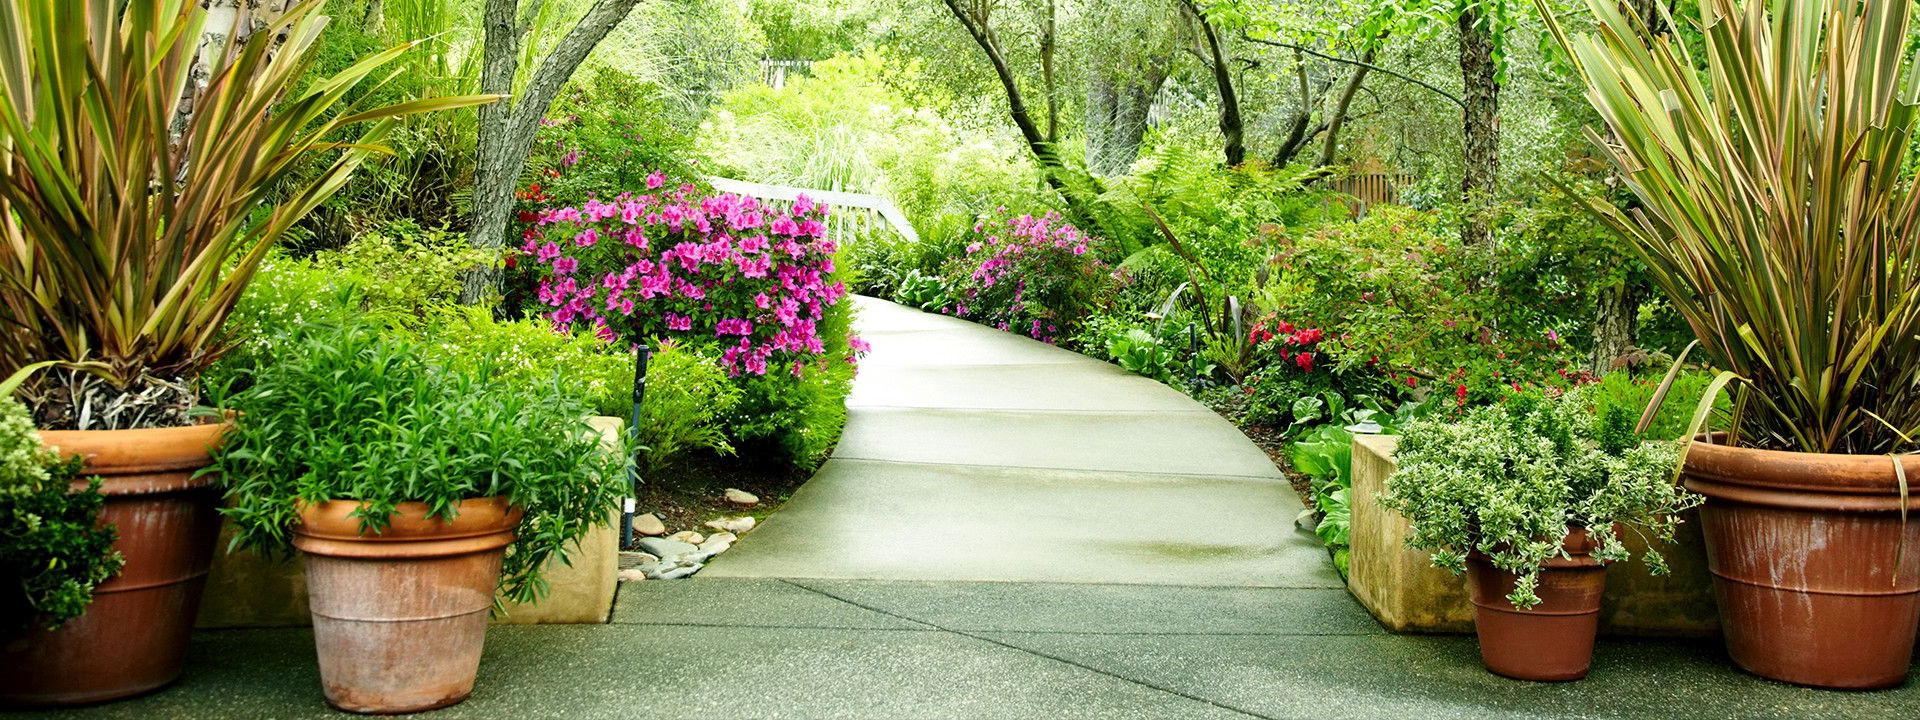 Resources   Emerald Hills Funeral Home & Memorial Park